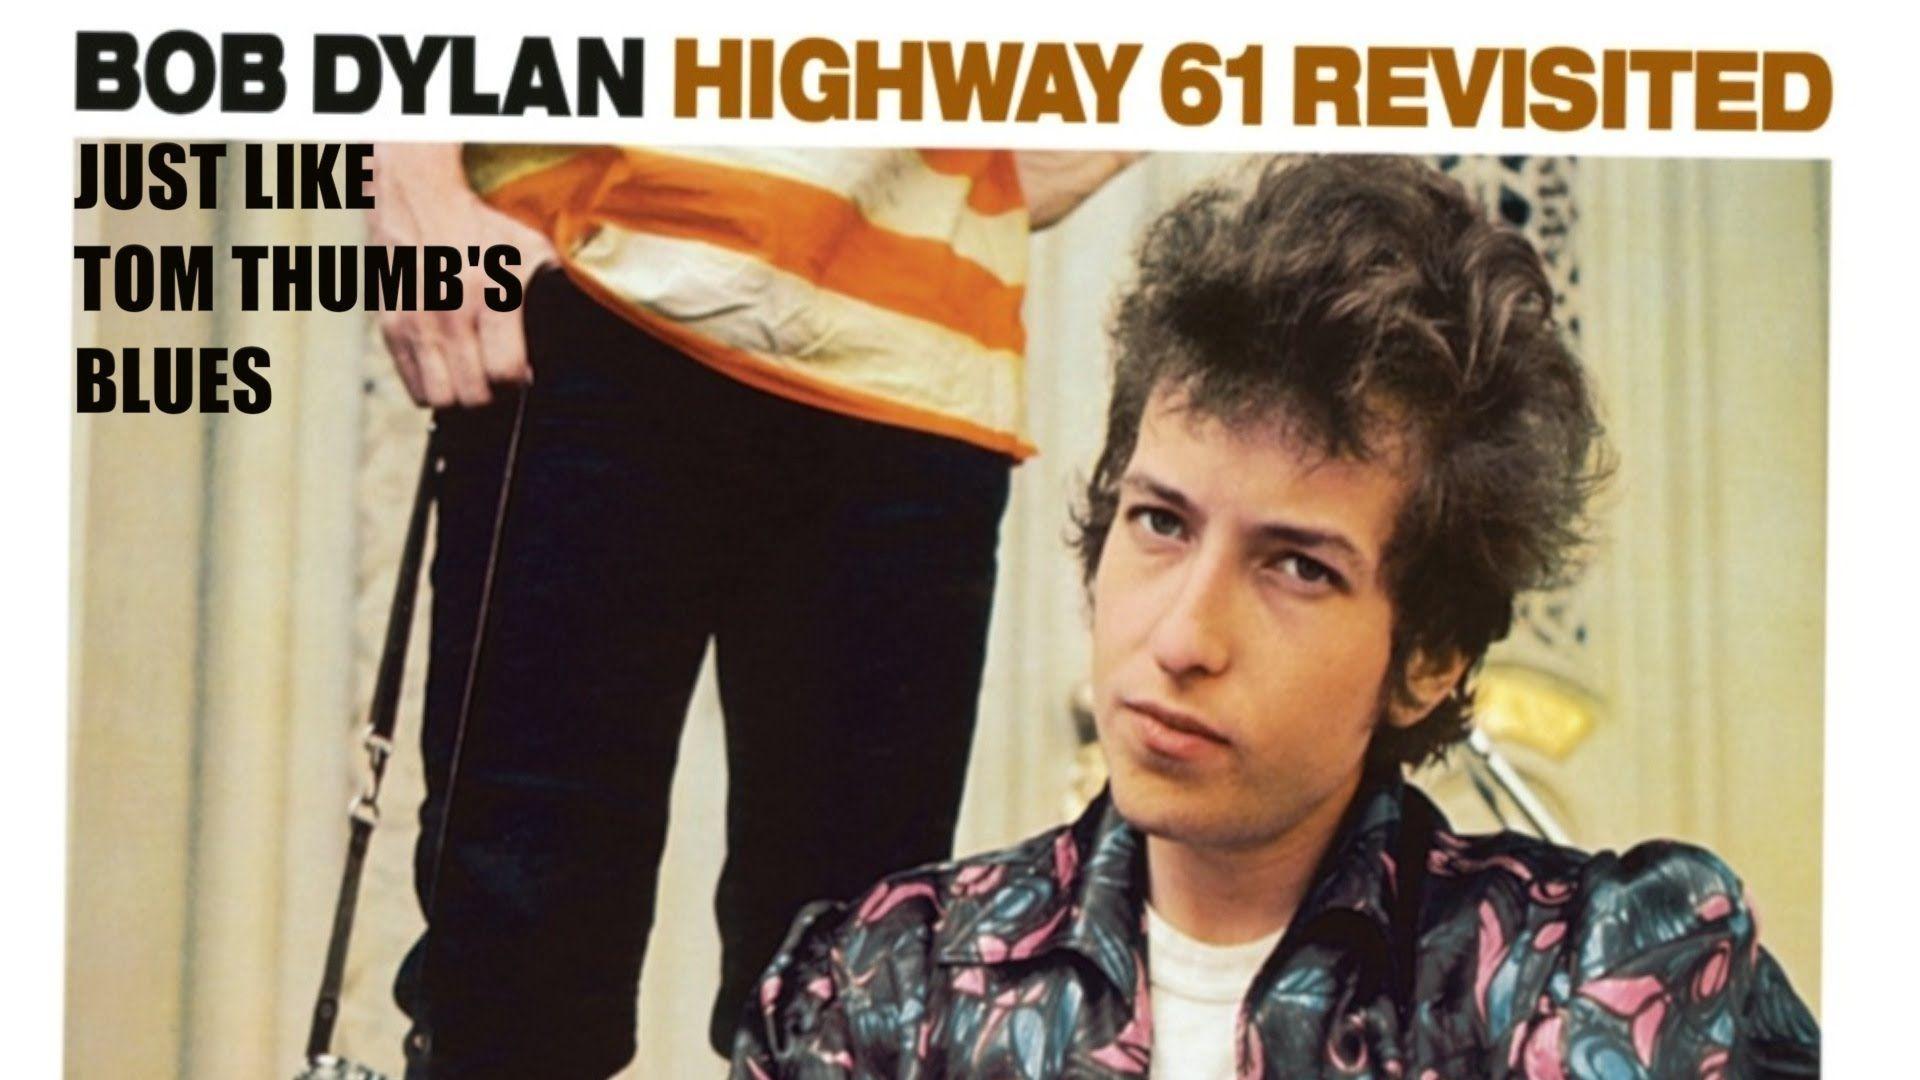 Bob Dylan Just Like Tom Thumb's Blues (Album Version